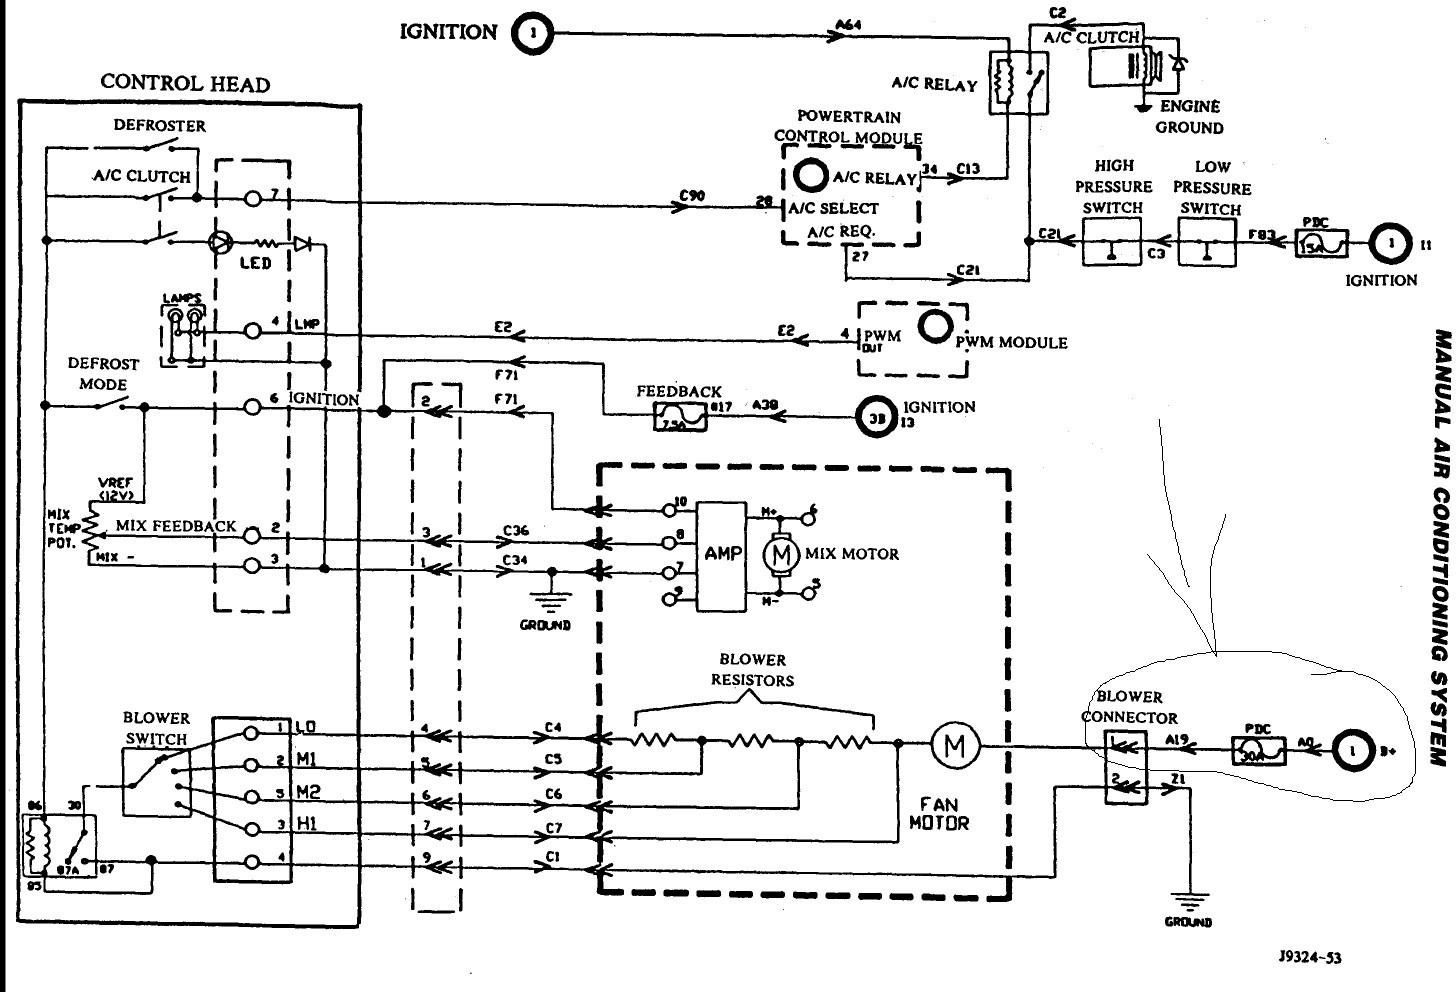 2001 Jeep Grand Cherokee Radio Wiring Diagram -Smart Pulse Fuse Box    Begeboy Wiring Diagram Source [ 992 x 1456 Pixel ]